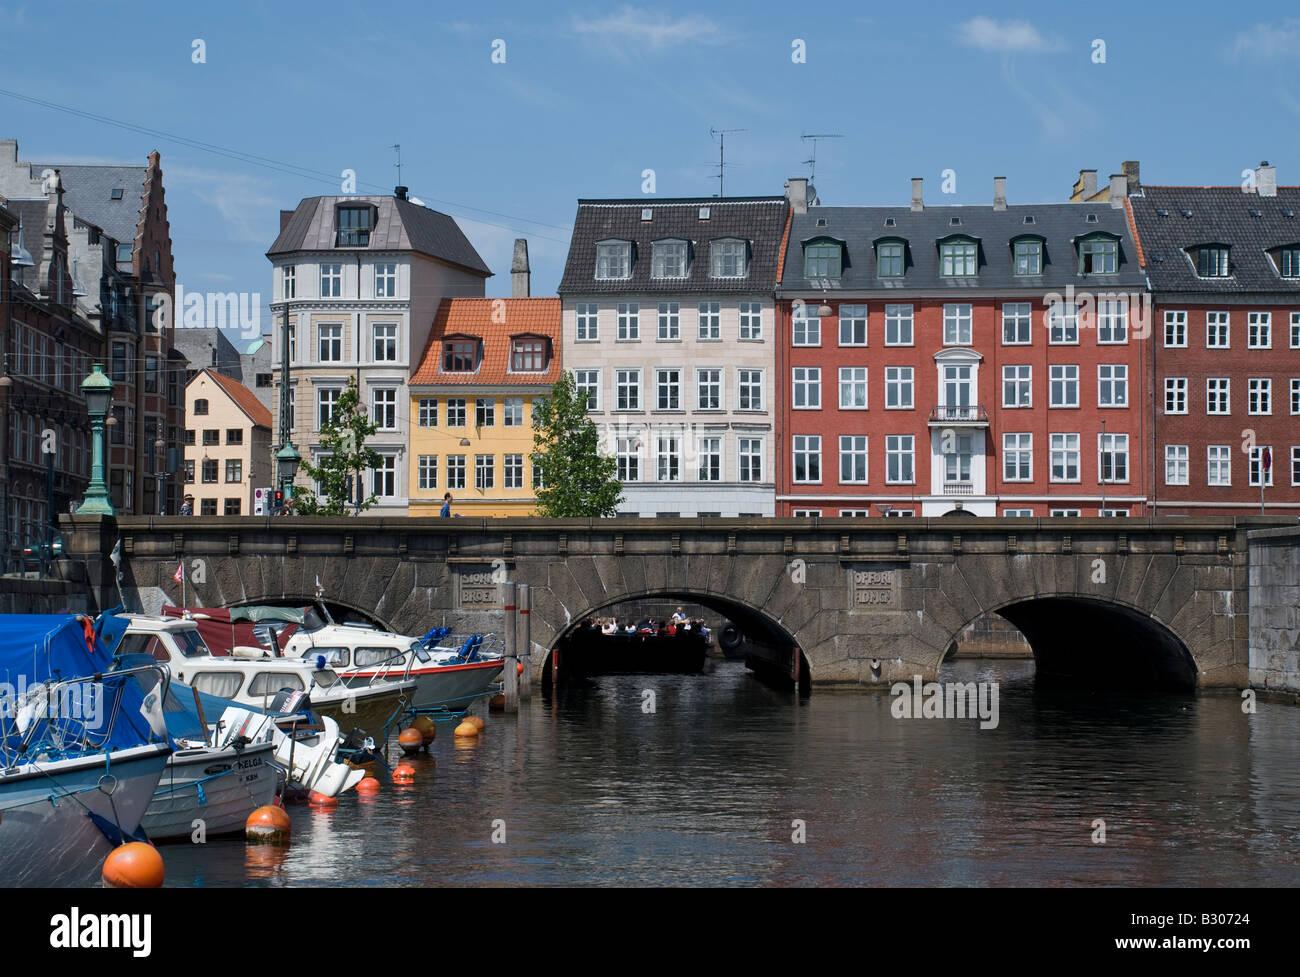 Vindebrogade Frederiksholms kanal canal Copenhagen - Stock Image